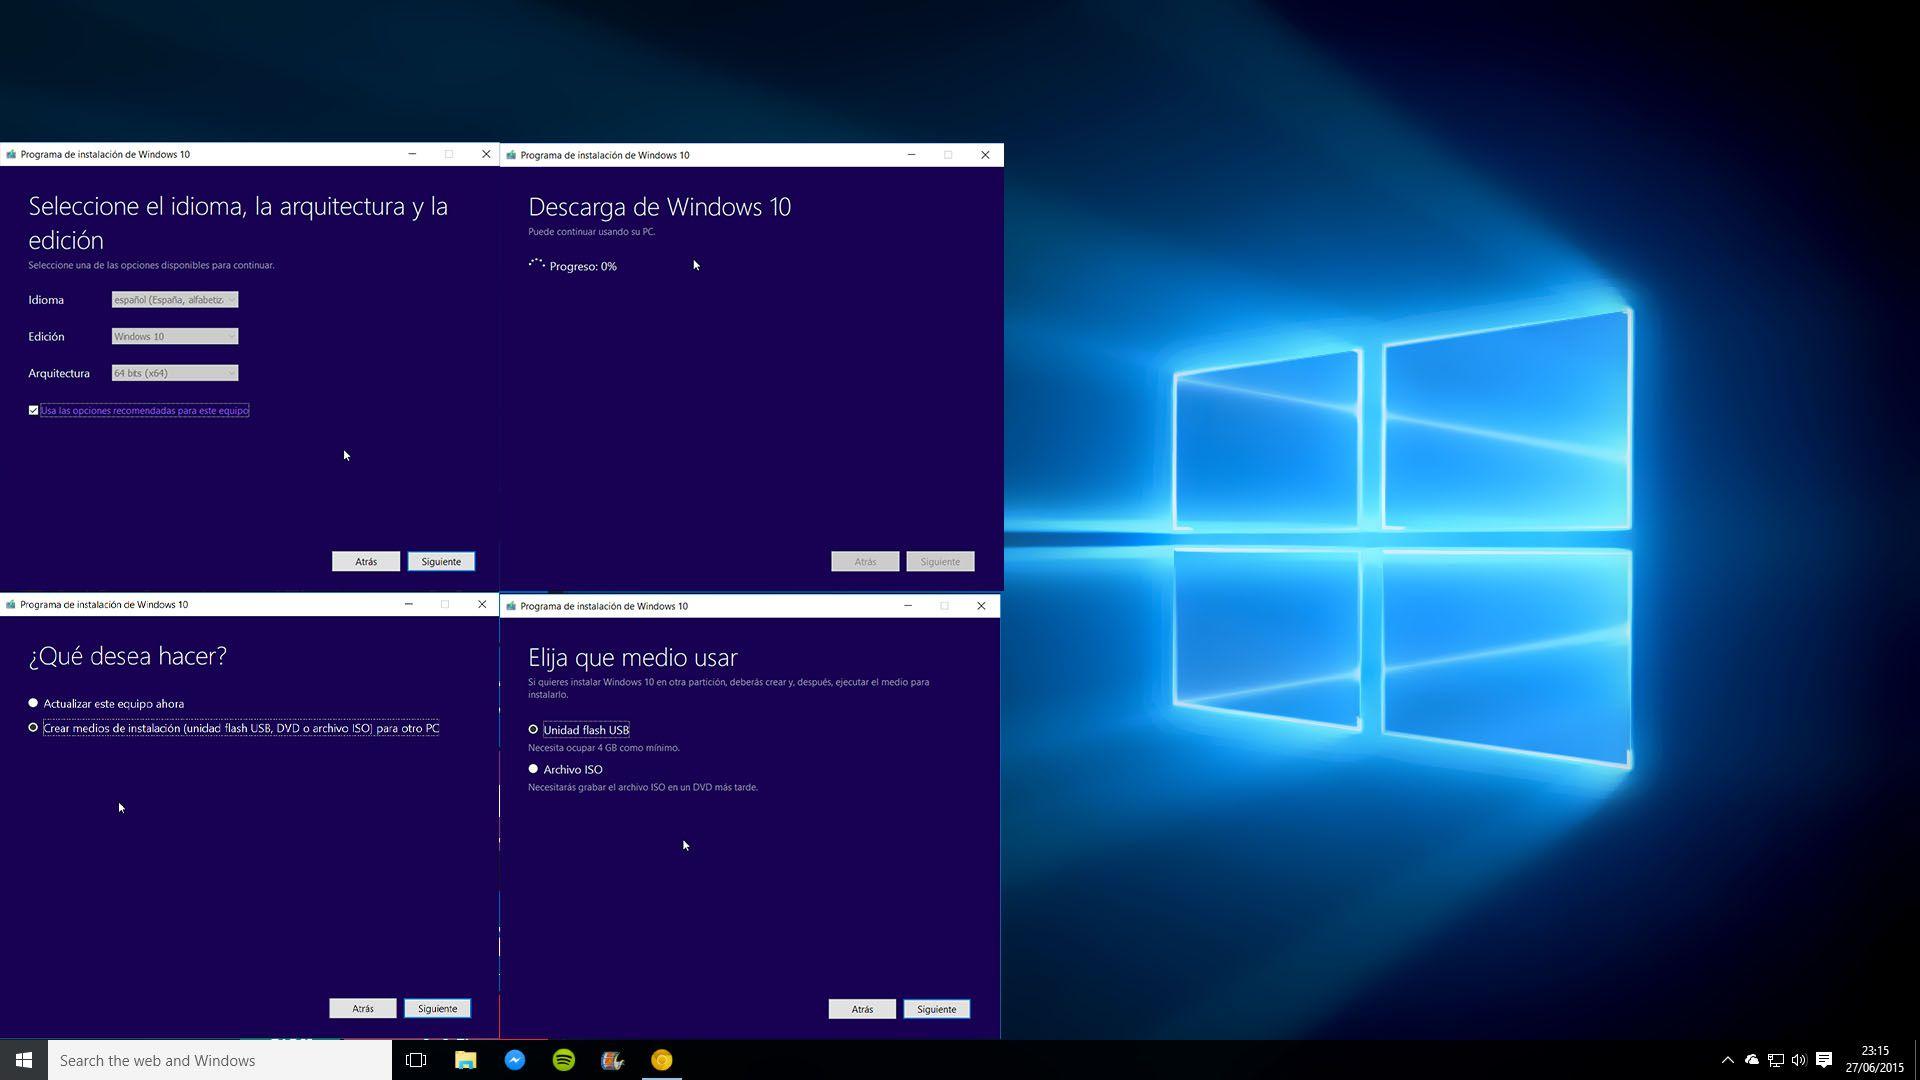 Descargar e instalar Windows 10 en Español con Media